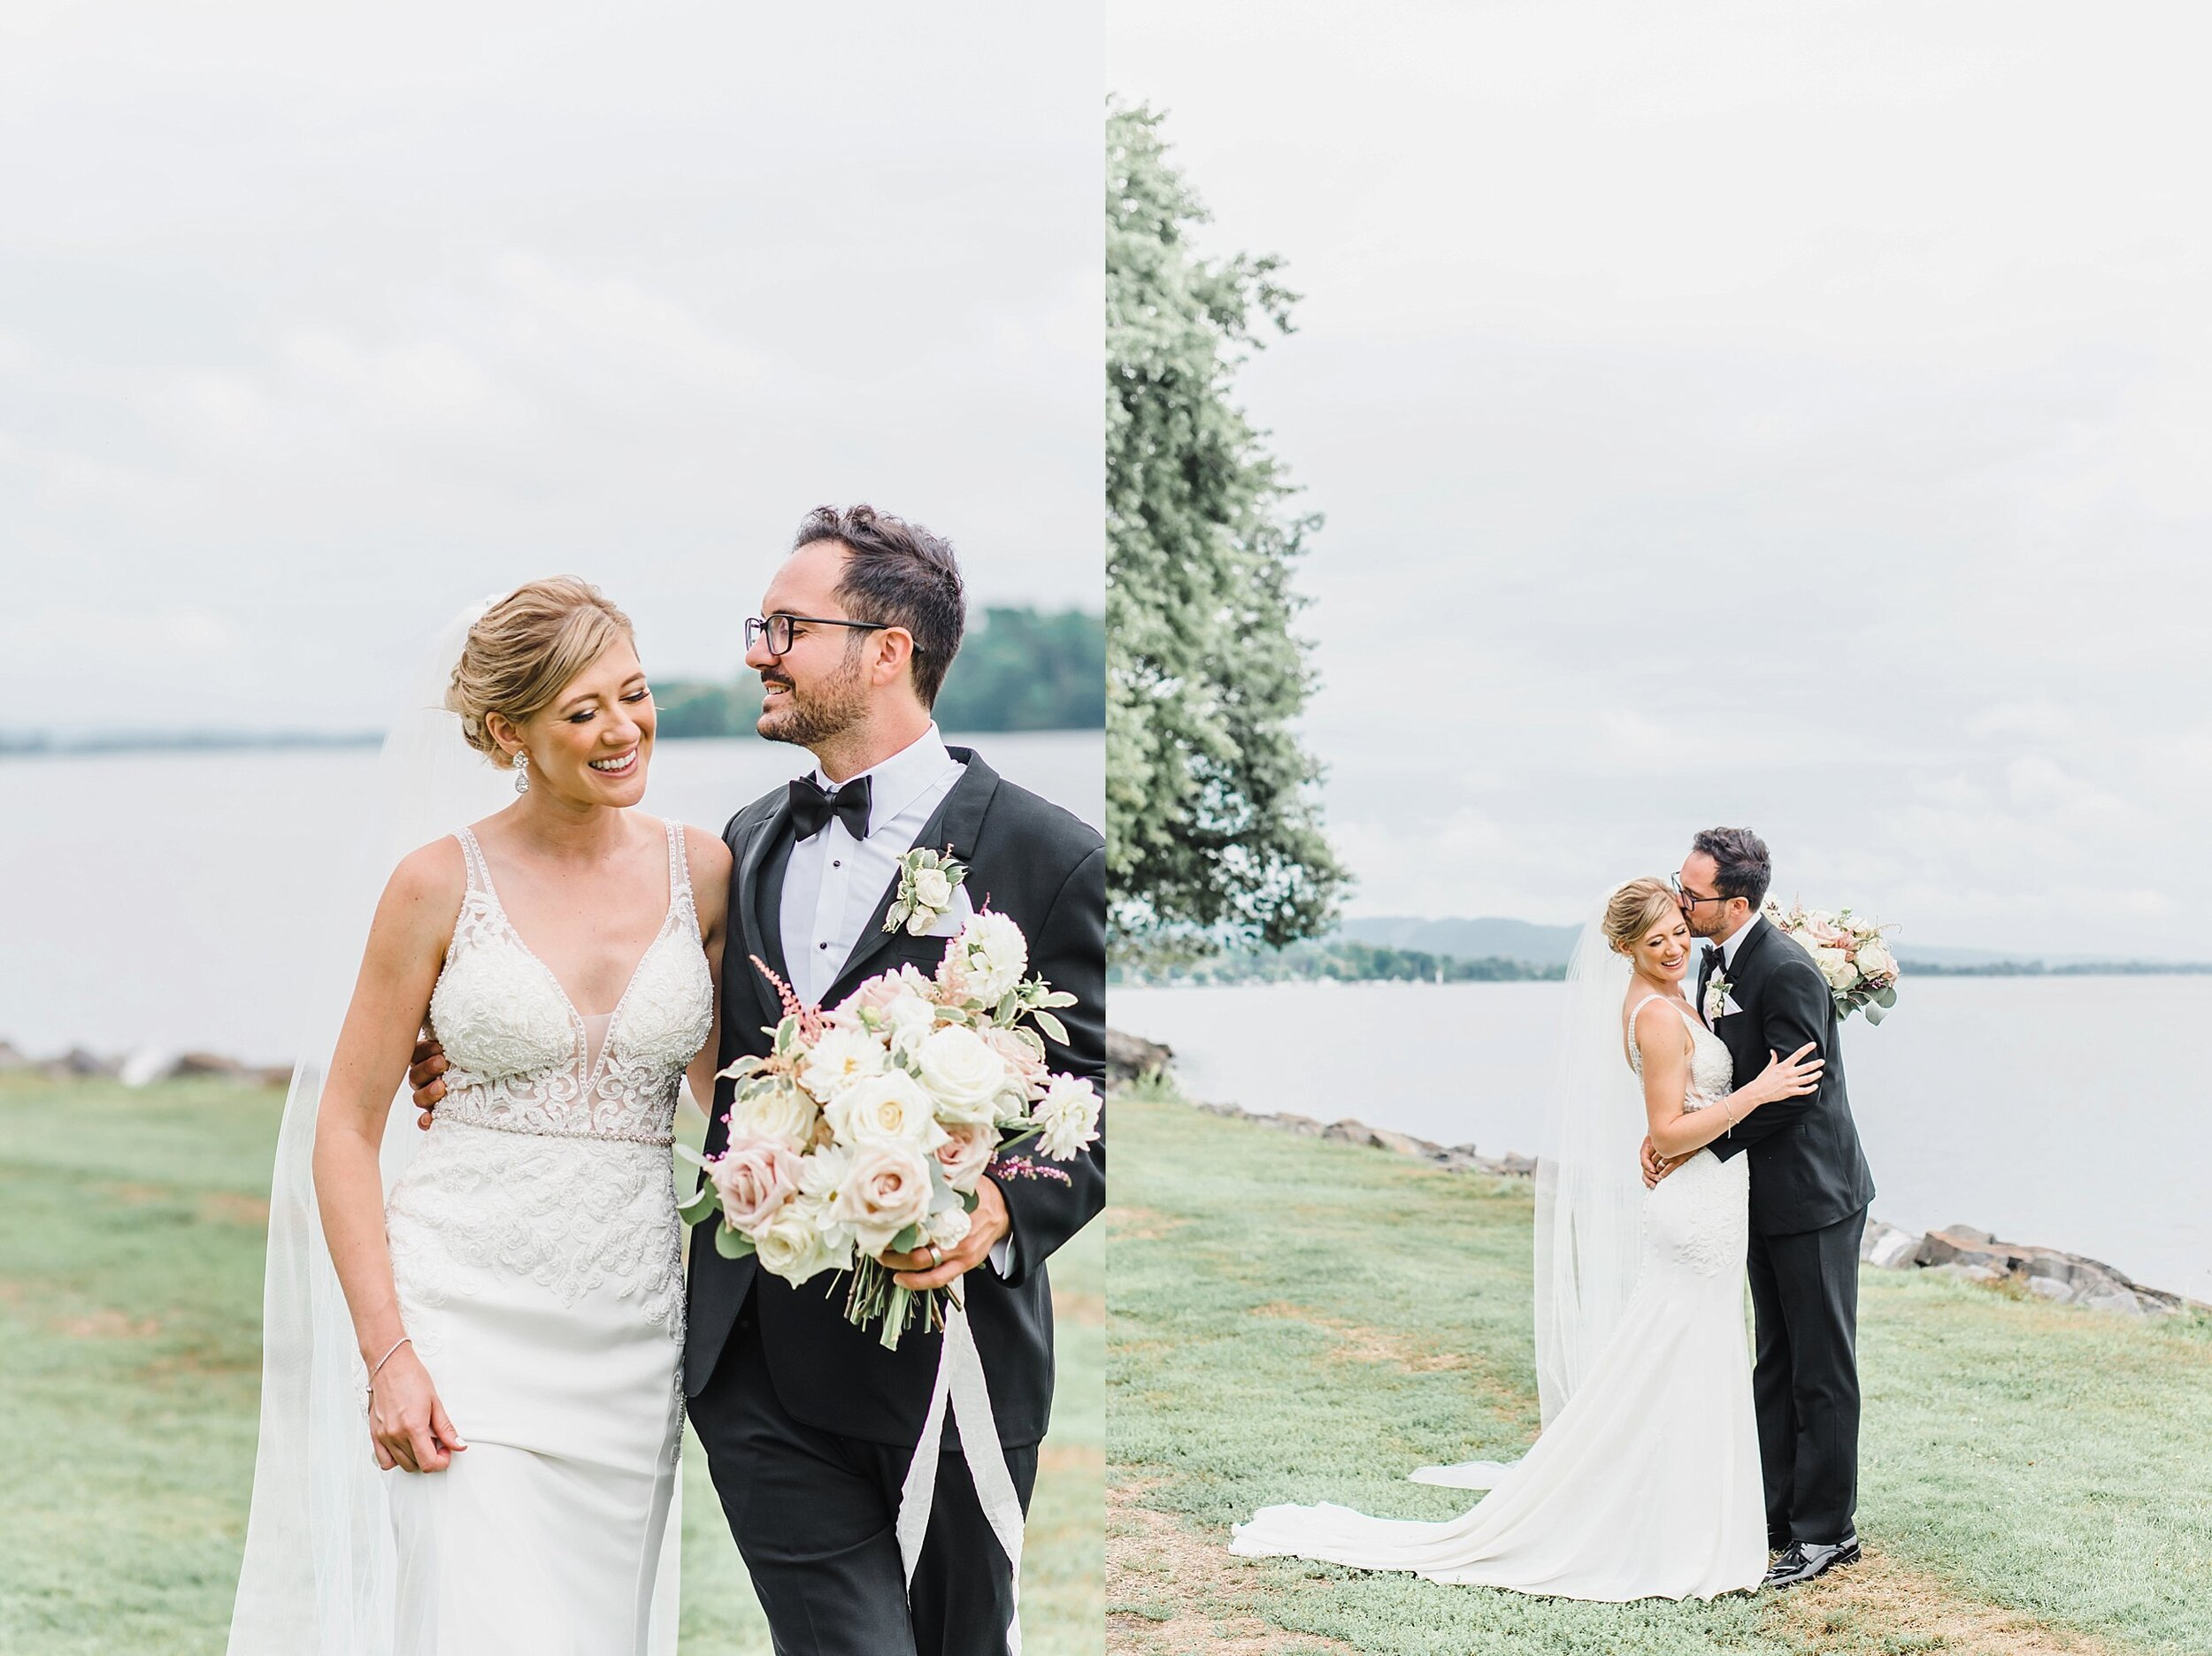 light airy fine art ottawa wedding photographer | Ali and Batoul Photography | Fairmont Le Chateau Montebello57.jpg